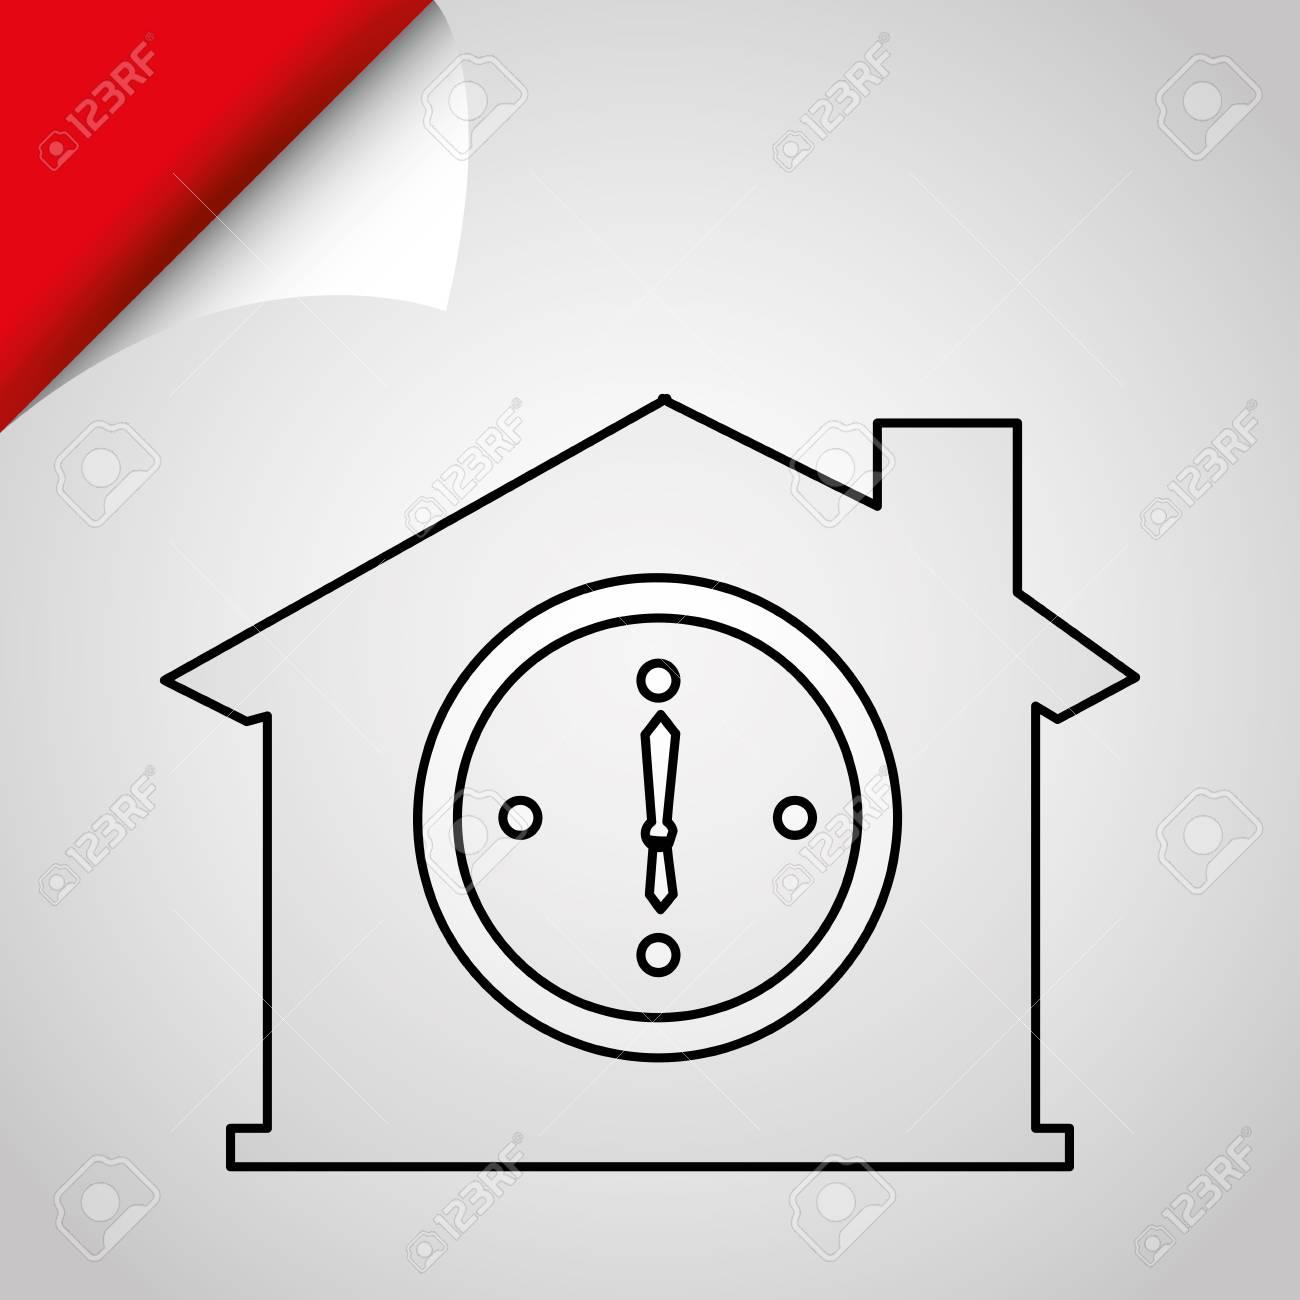 home depot design, vector illustration eps10 graphic